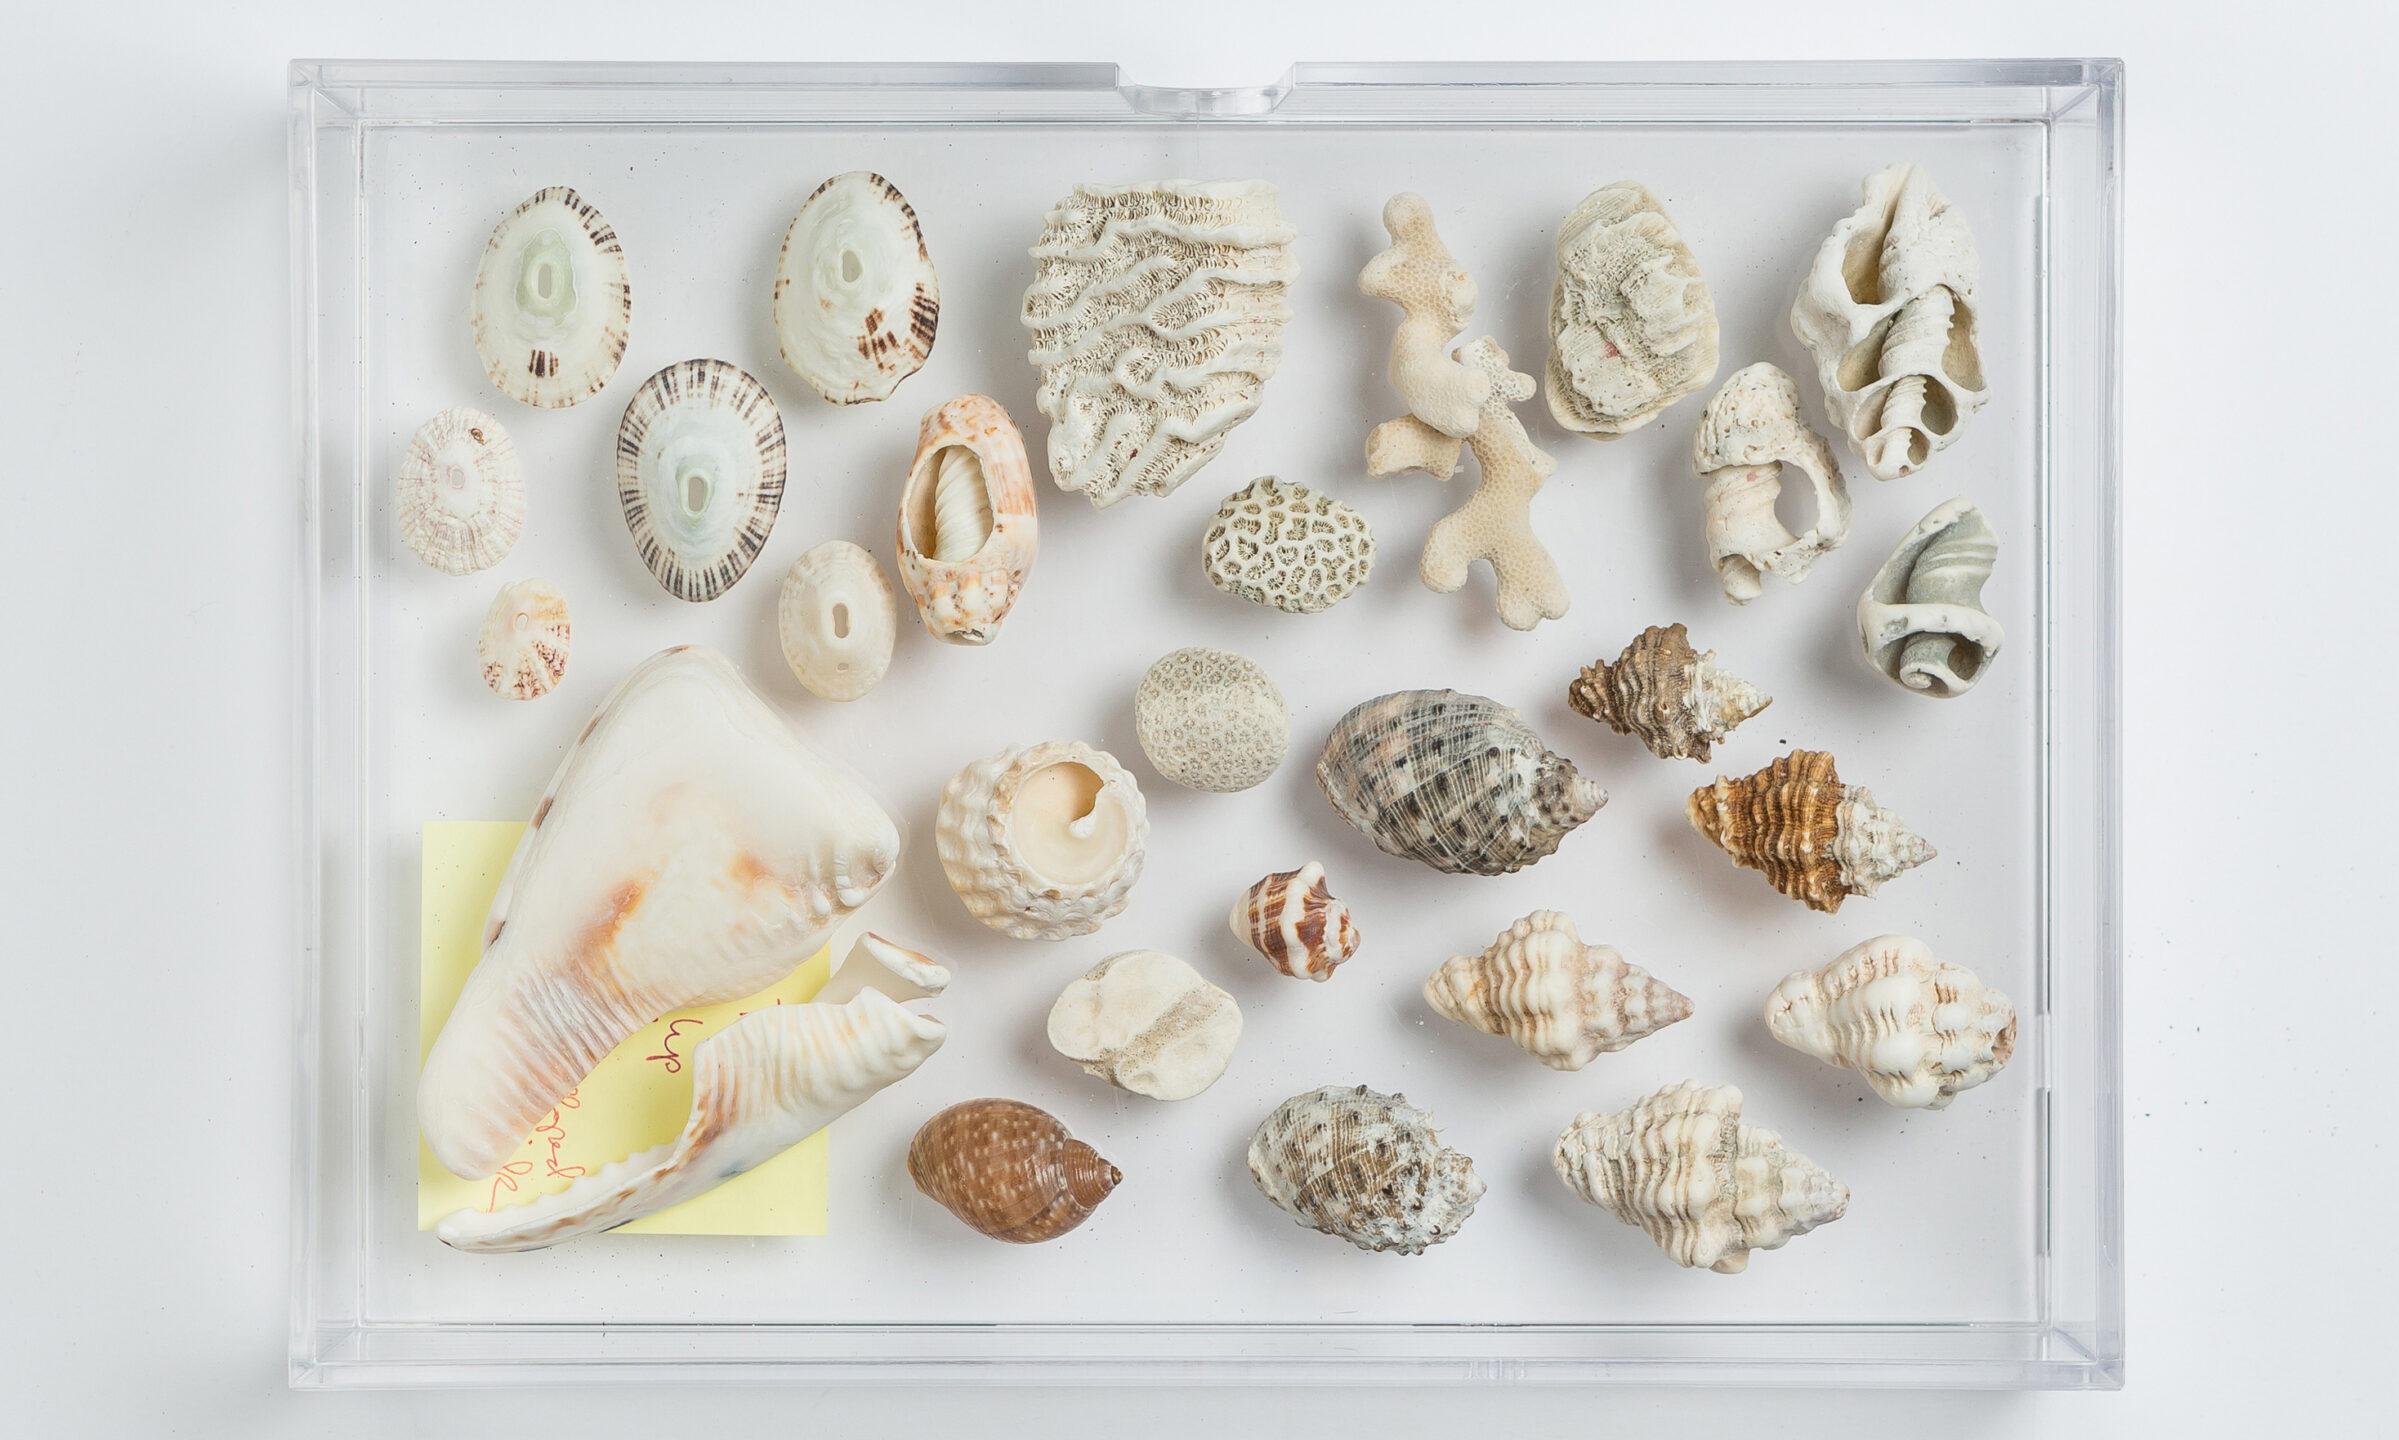 mish_products_earrings_Cabana-Nautilus-ER-Editorial-2_resize